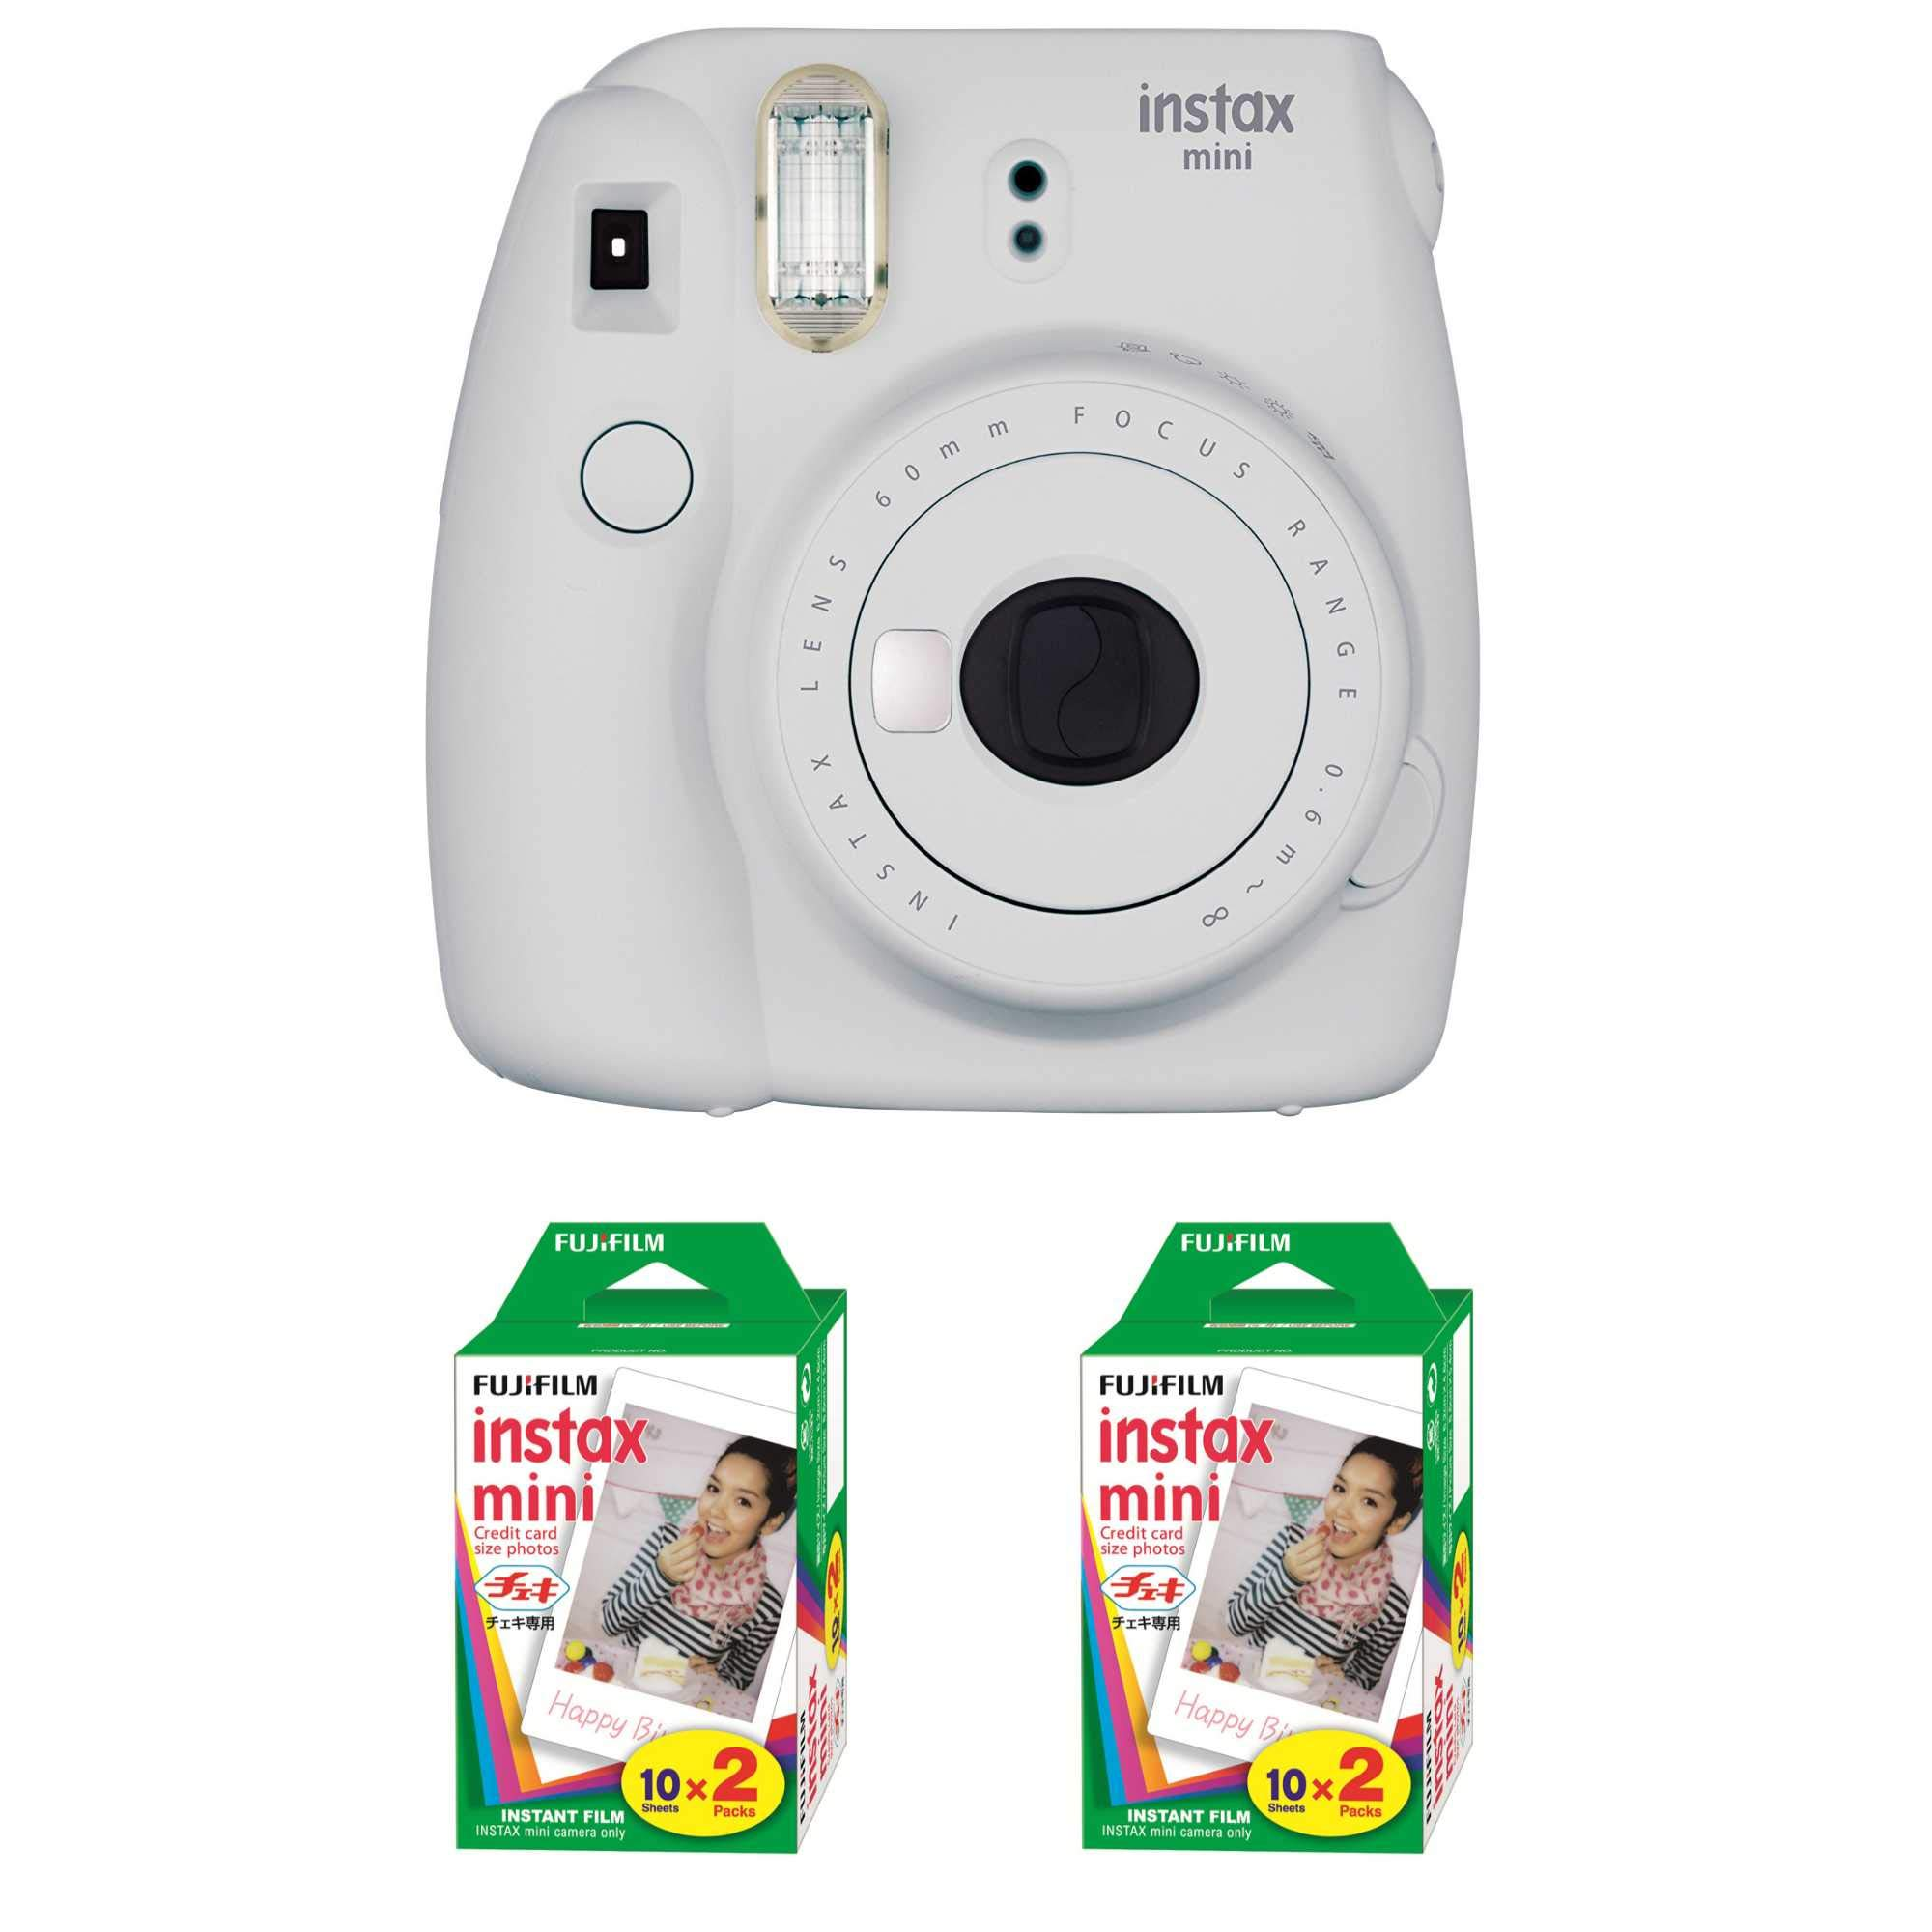 Fujifilm Instax Mini 9 Instant Camera (Smokey White) with 2 x Instant Twin Film Pack (40 Exposures) by Fujifilm